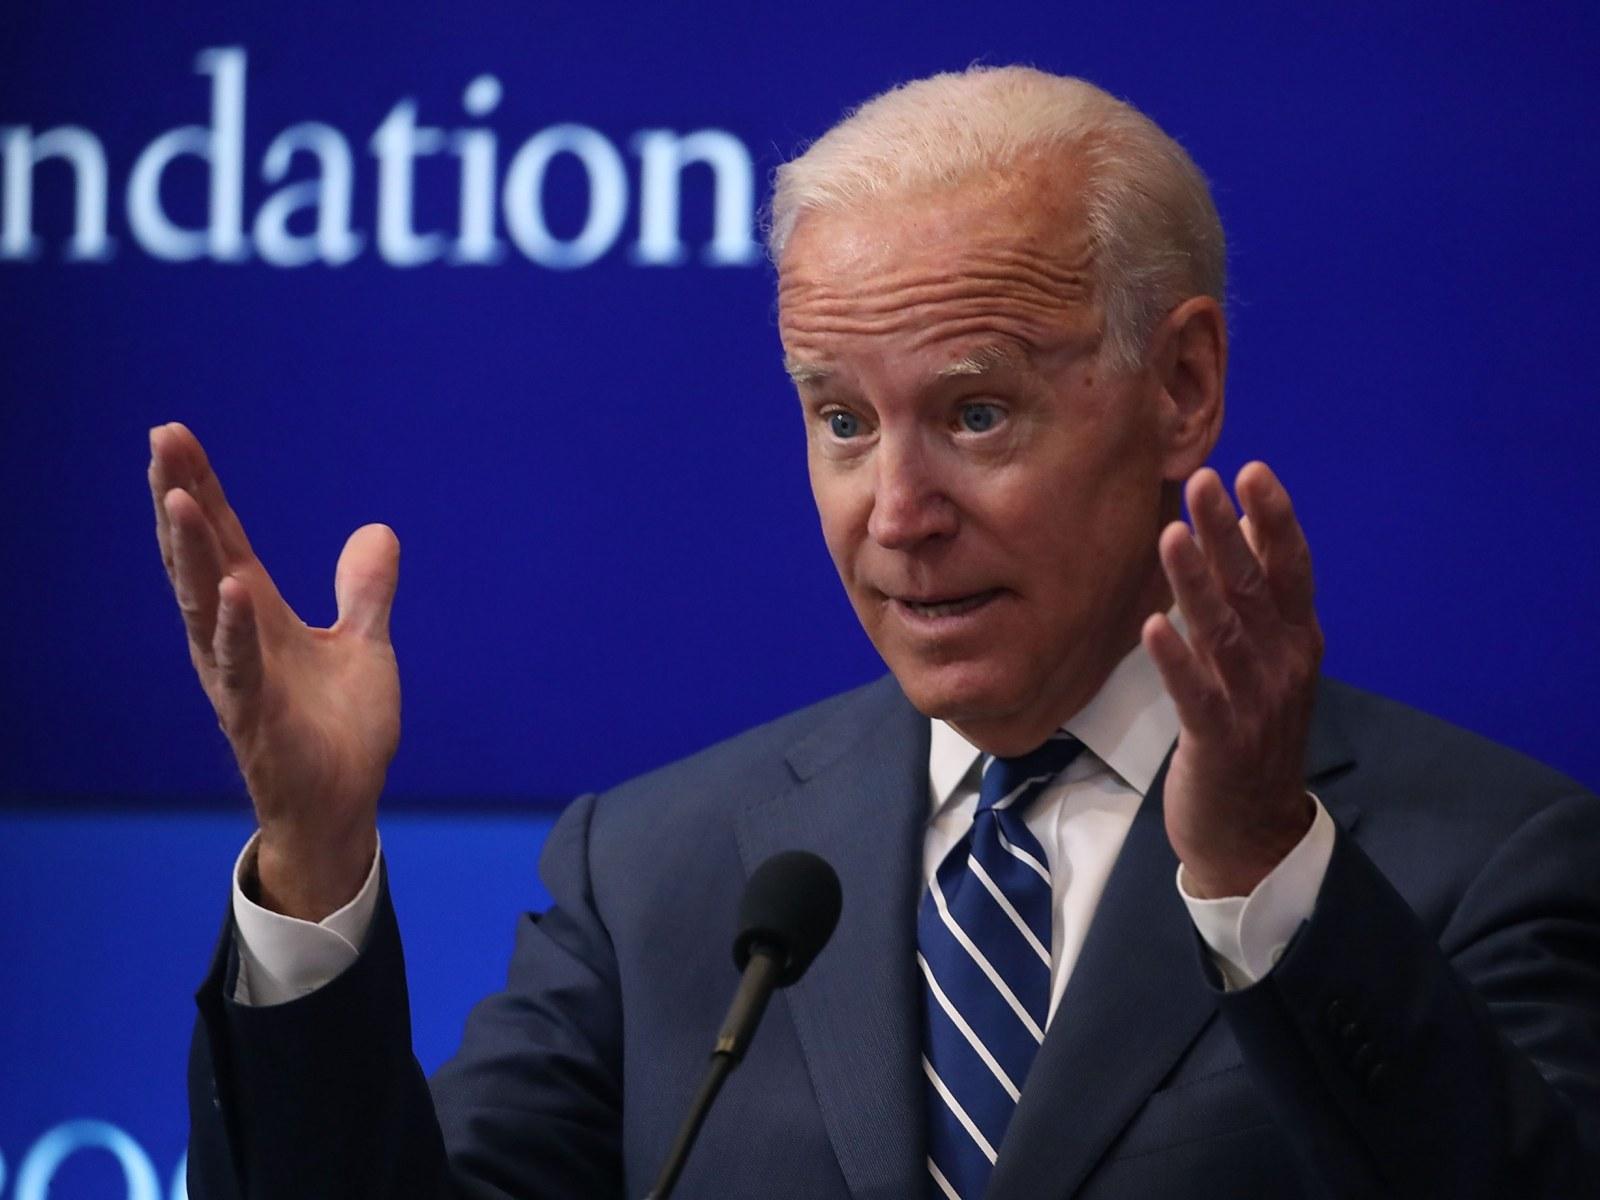 Joe Biden's Biggest Gaffes: Quotes, Blunders That Could Hurt